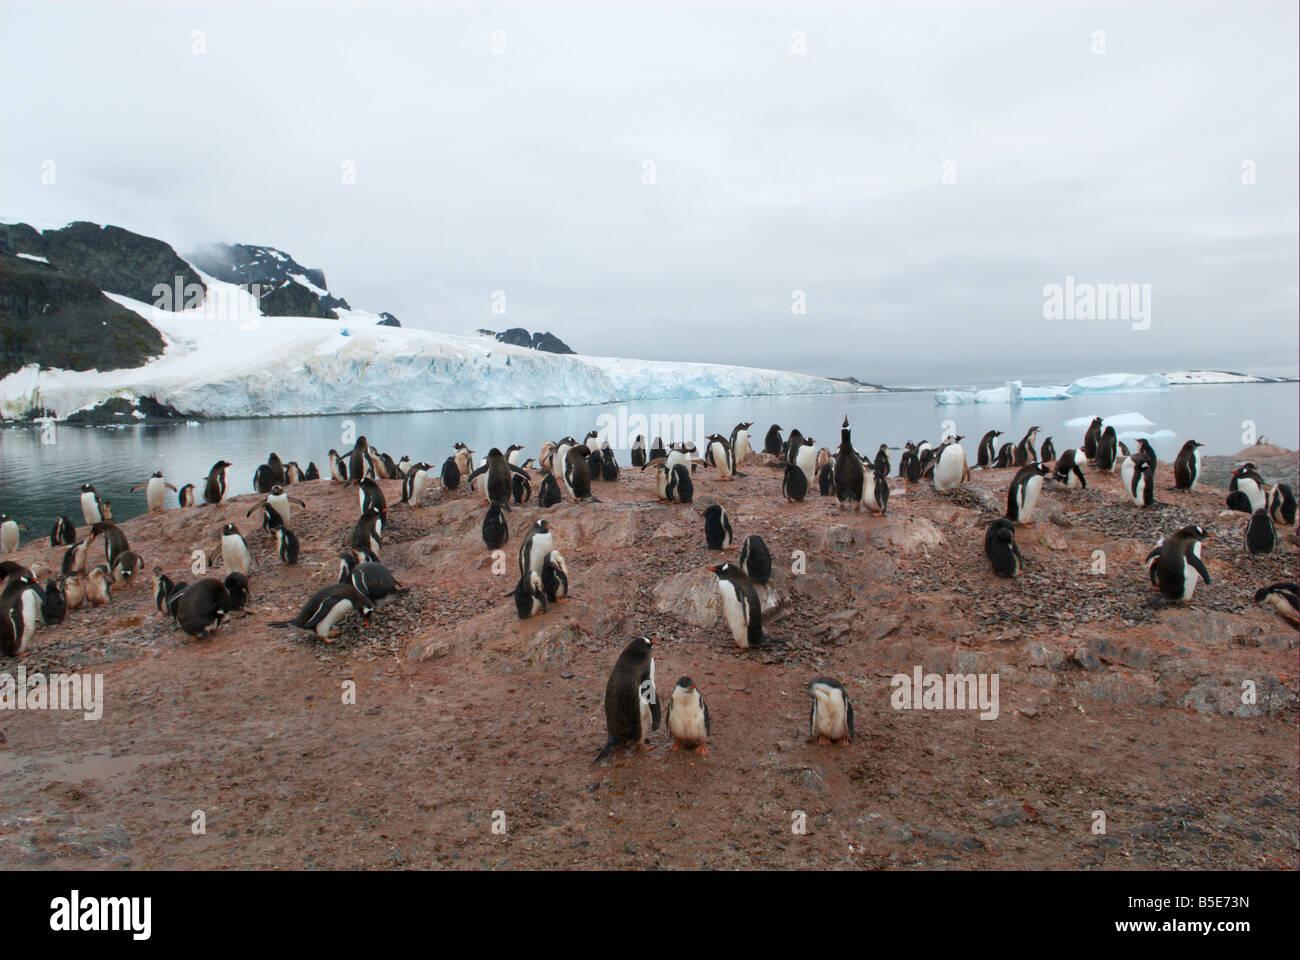 Gentoo penguin breeding colony - Stock Image